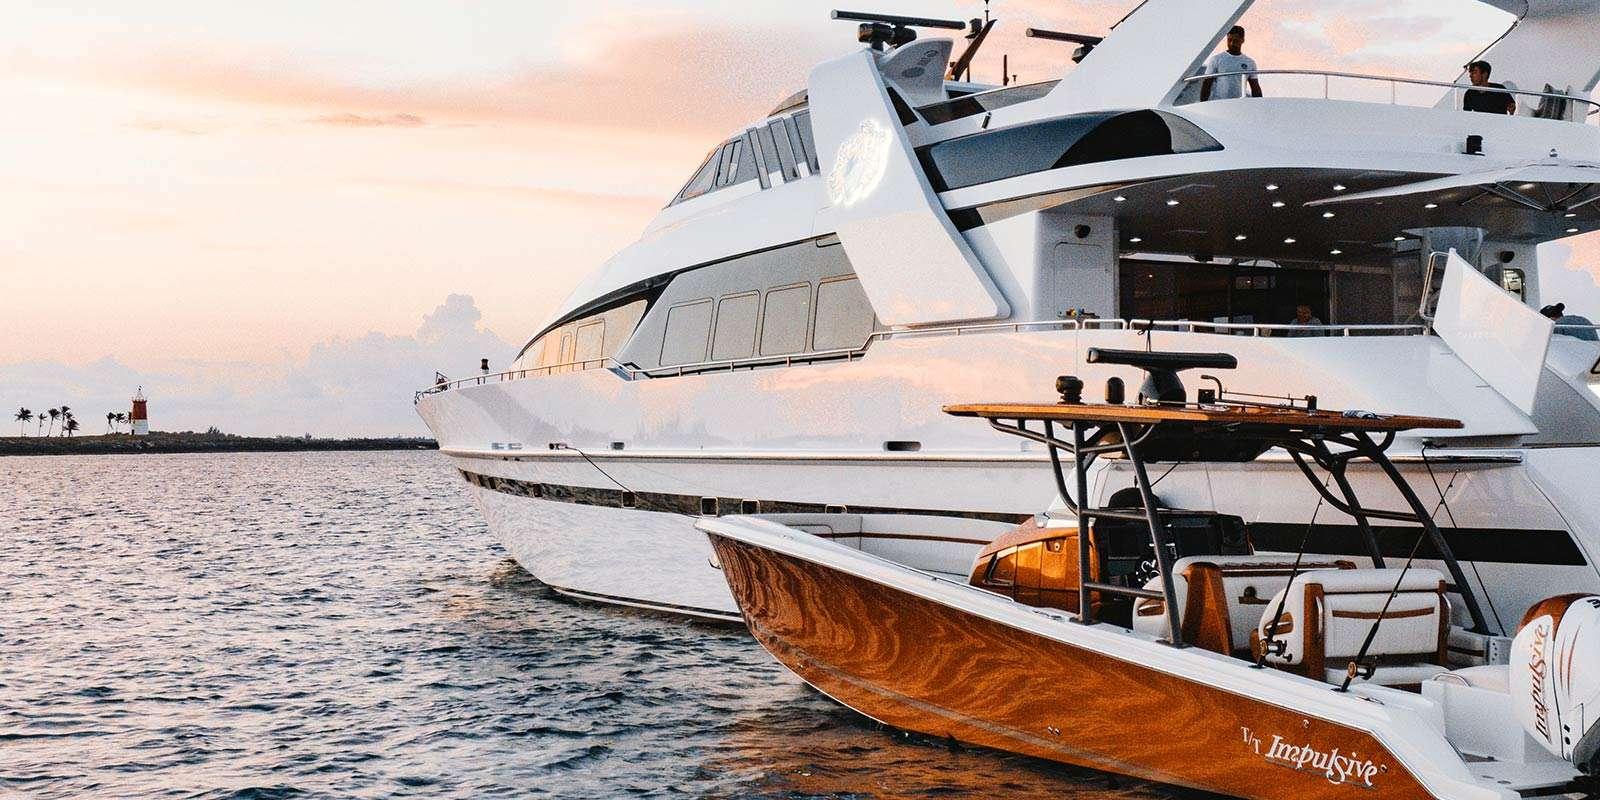 Impulsive yacht image # 14